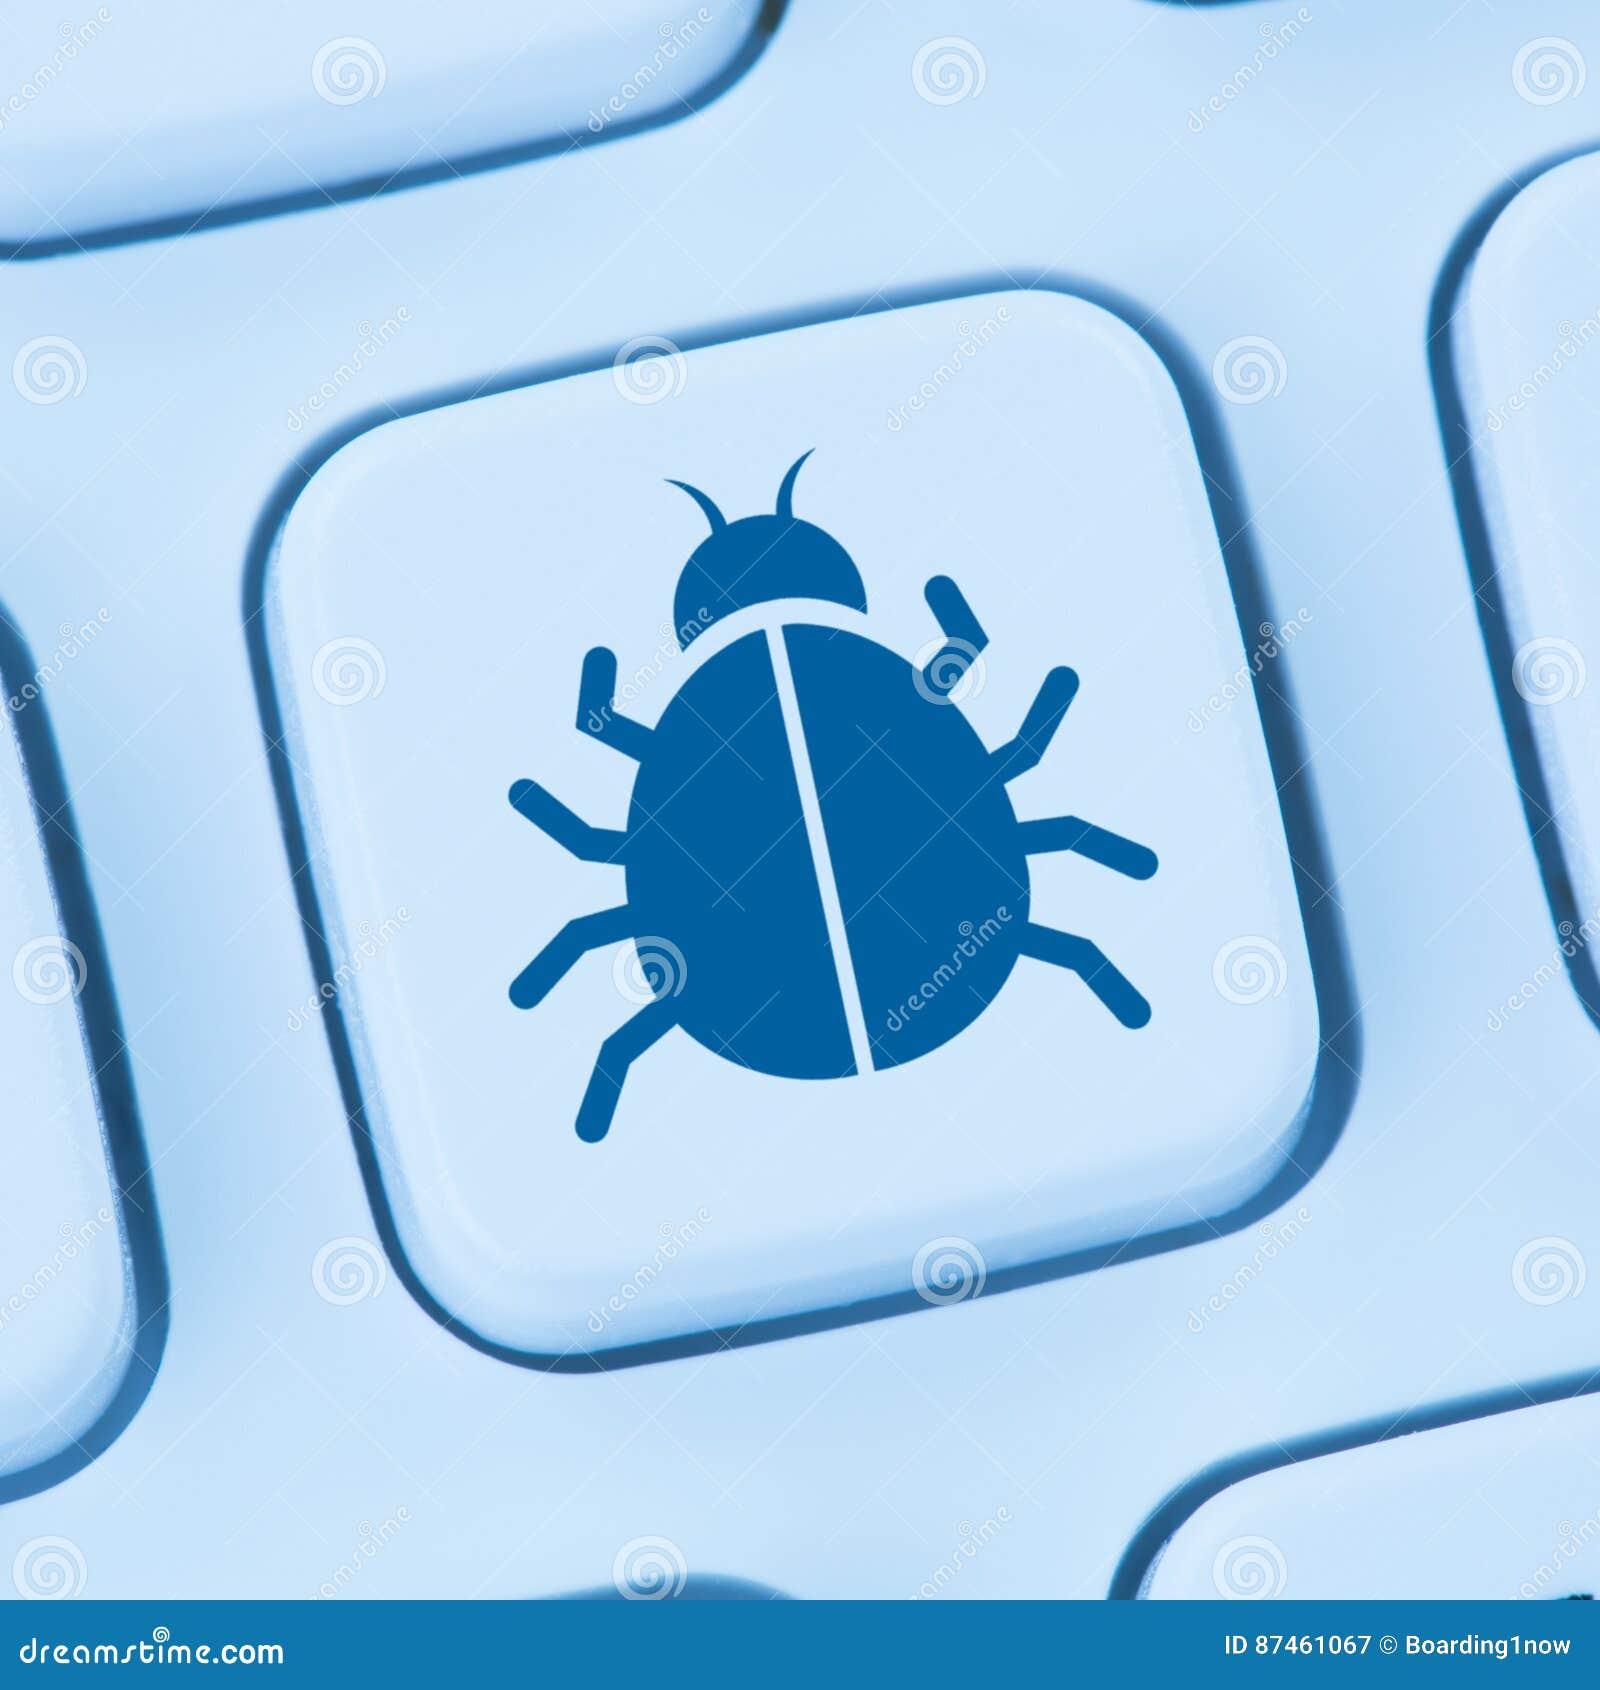 Viral Times Web: Computer Virus Trojan Network Online Security Blue